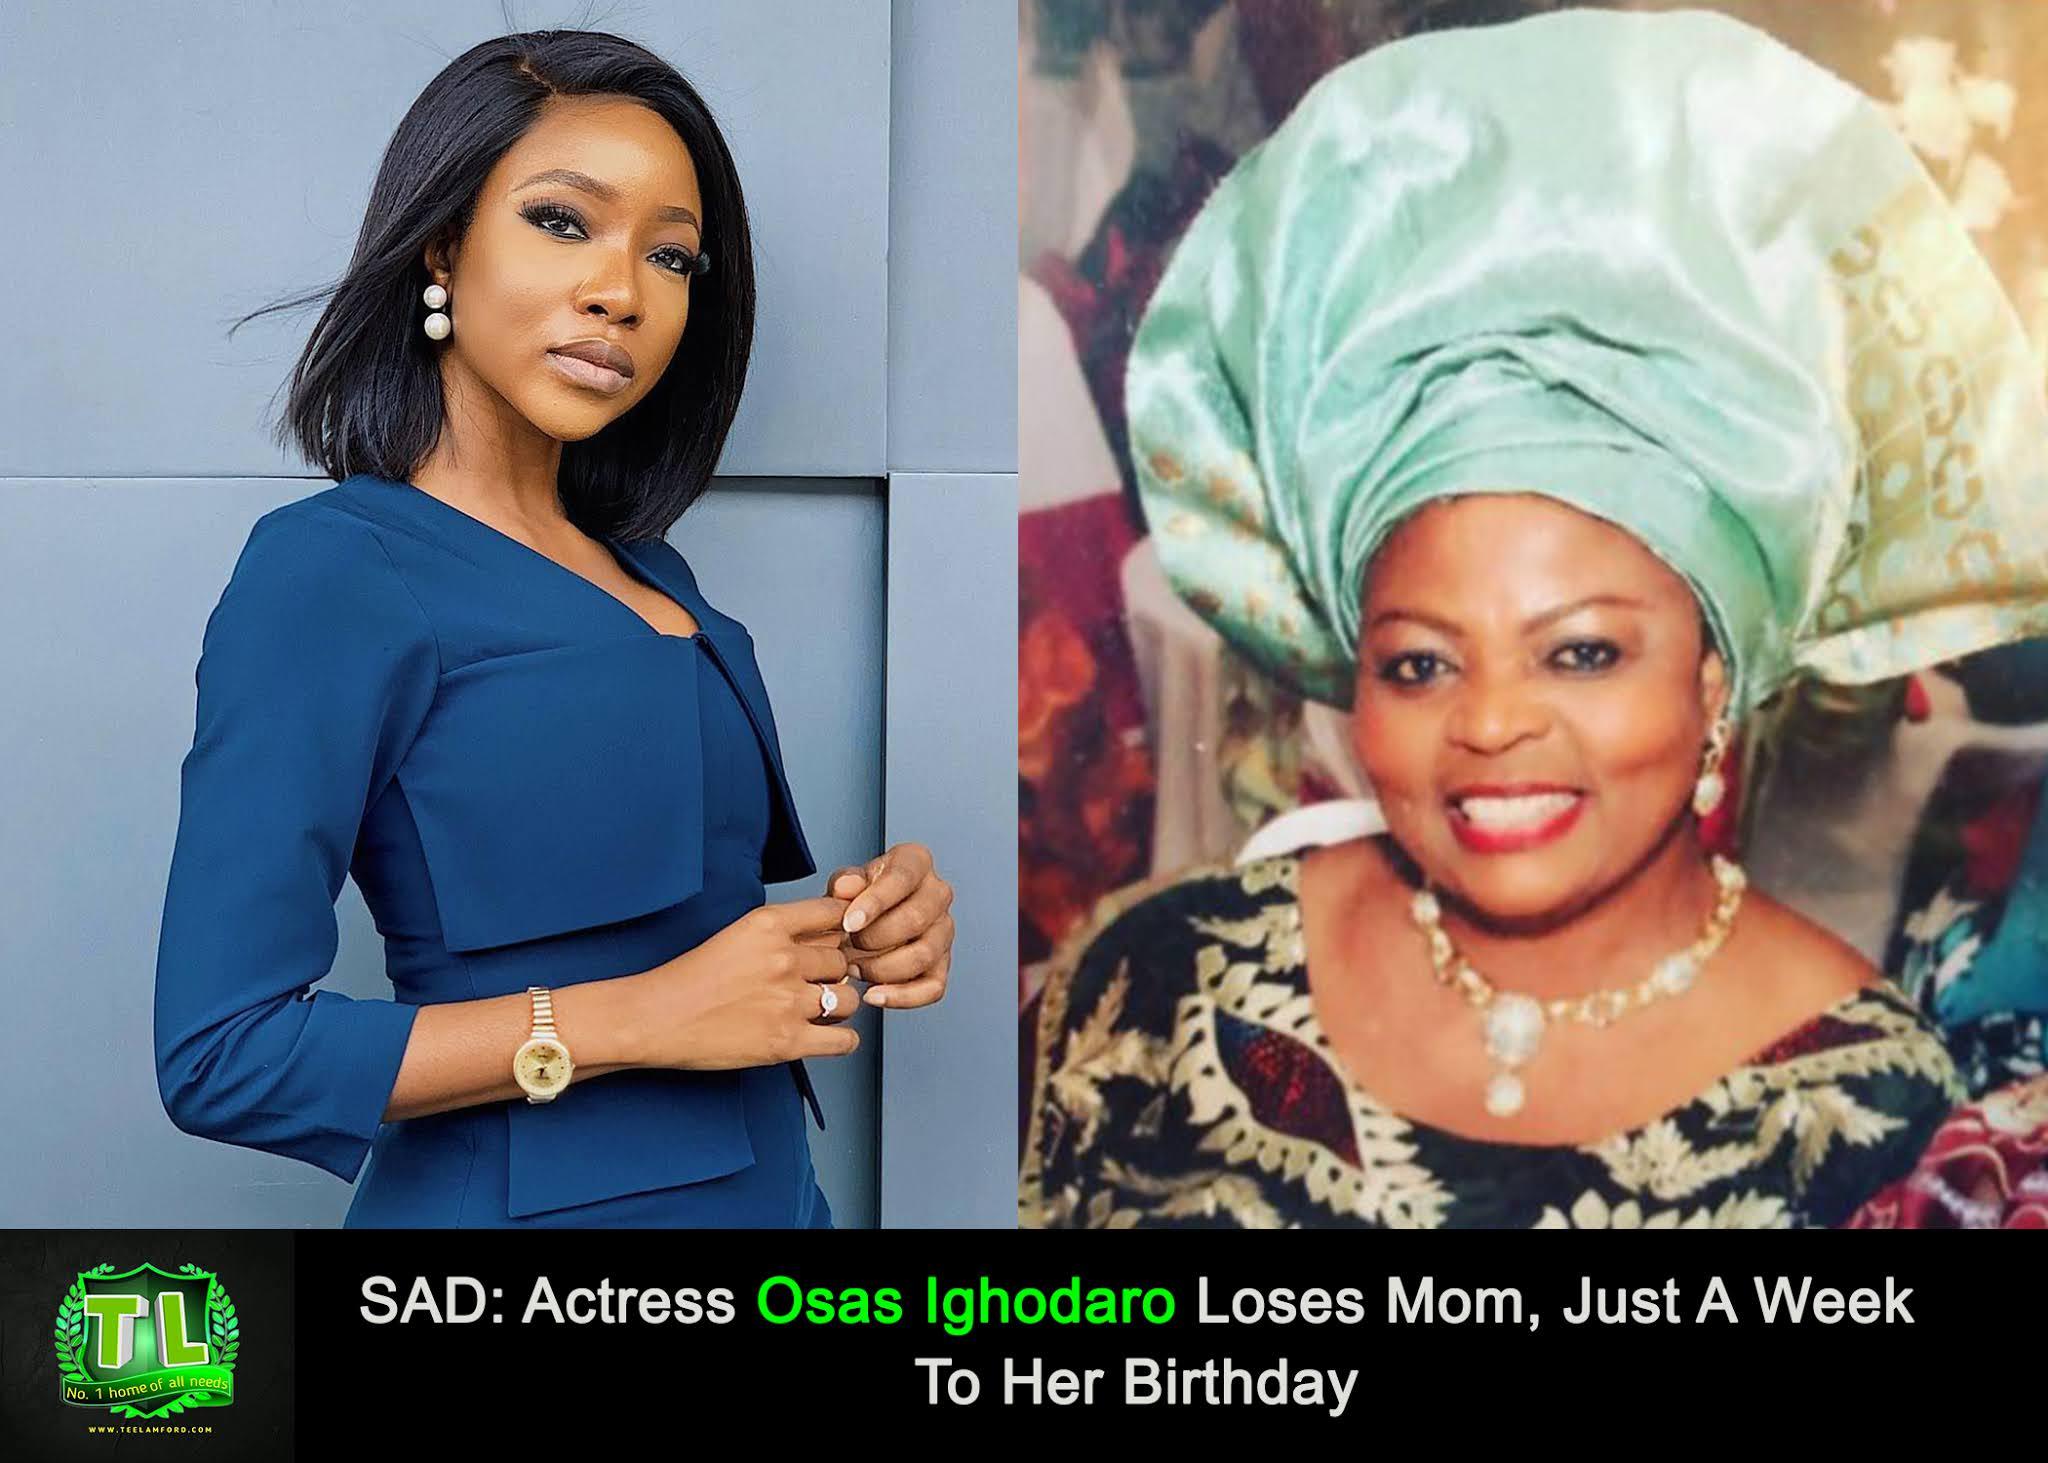 Osas-Ighodaro-Loses-Mom-Just-A-Week-To-Her-Birthday-Teelamford